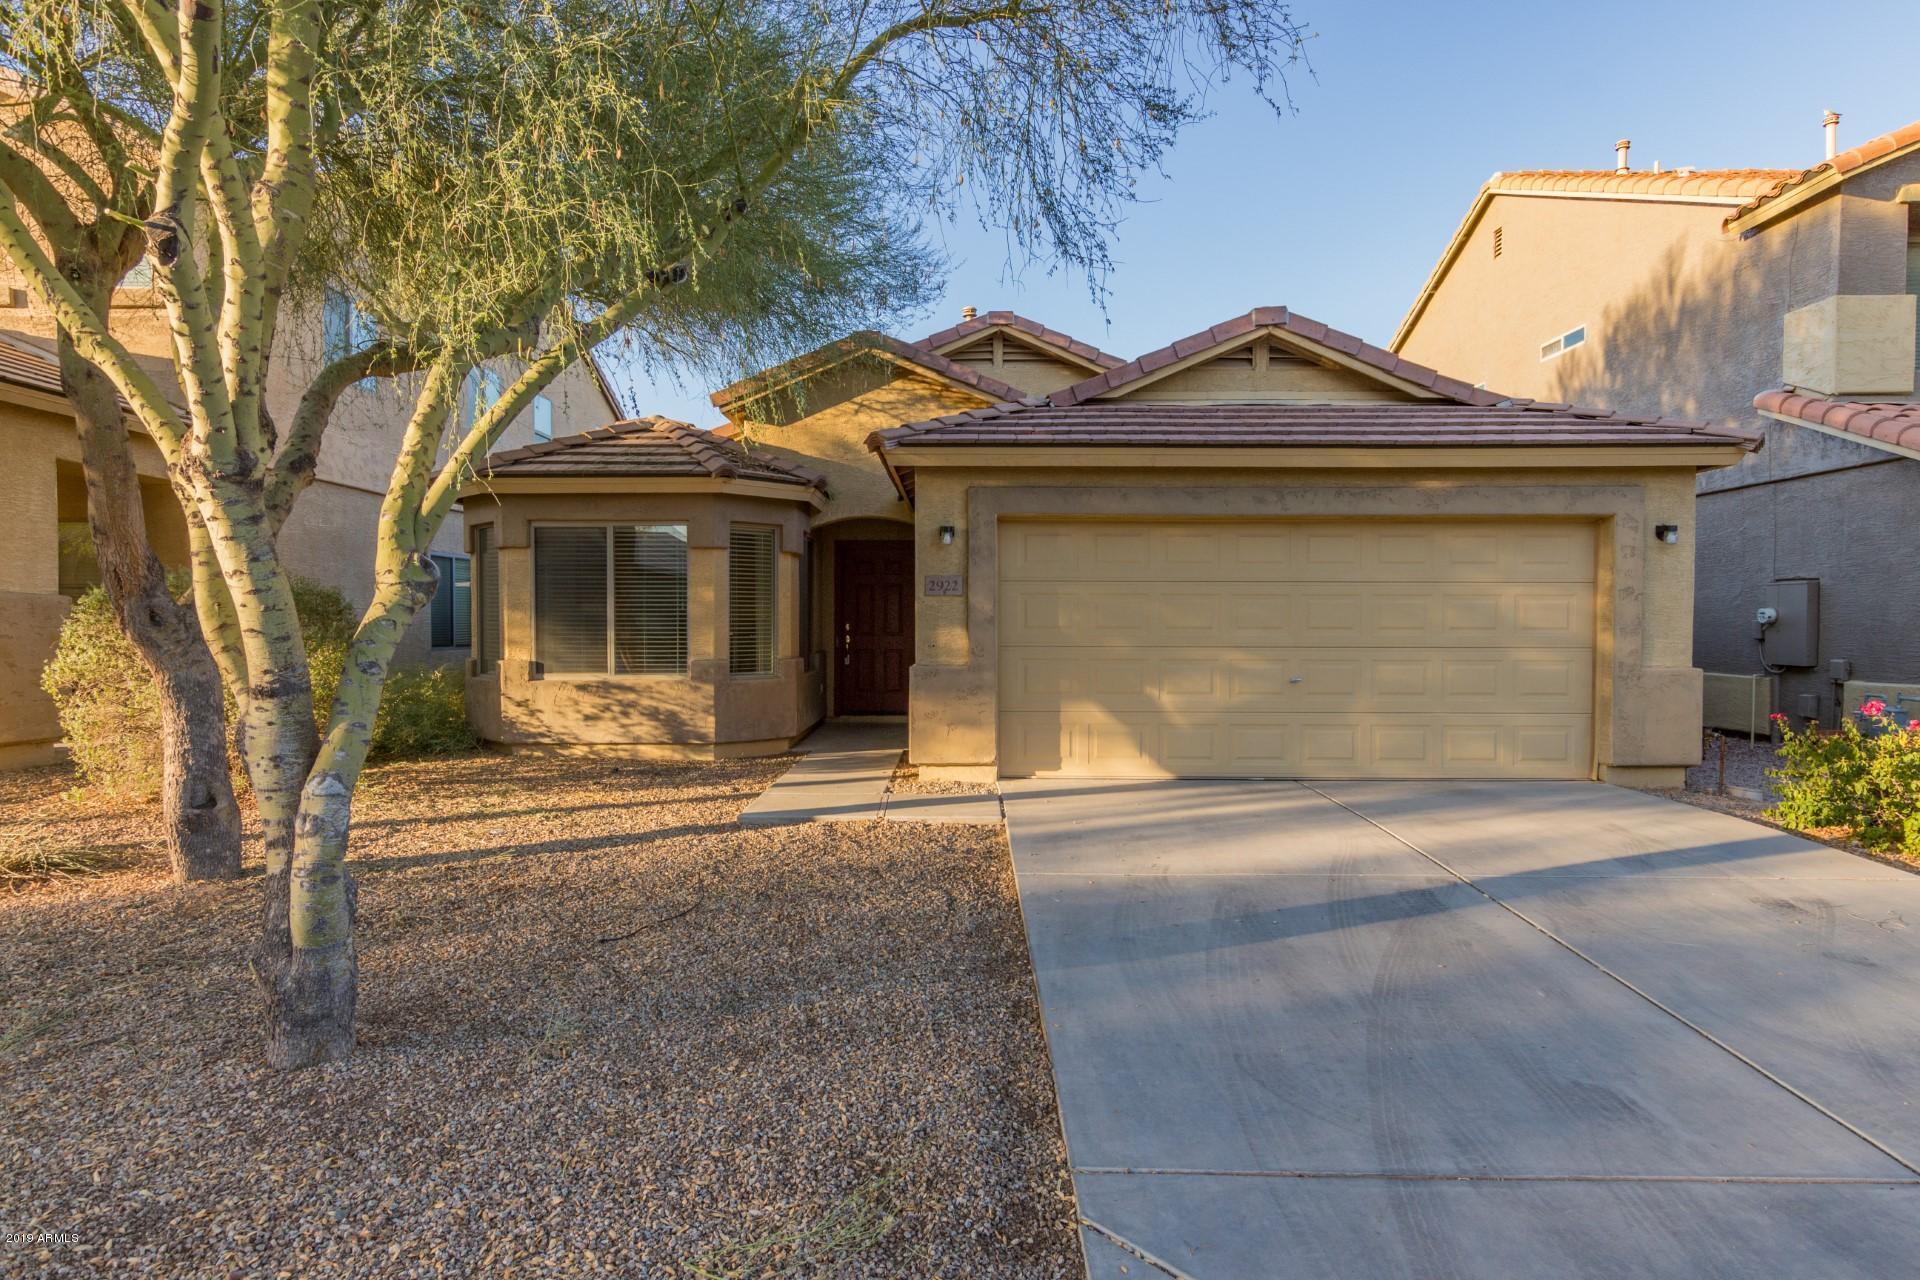 Photo of 2922 W JASPER BUTTE Drive, Queen Creek, AZ 85142